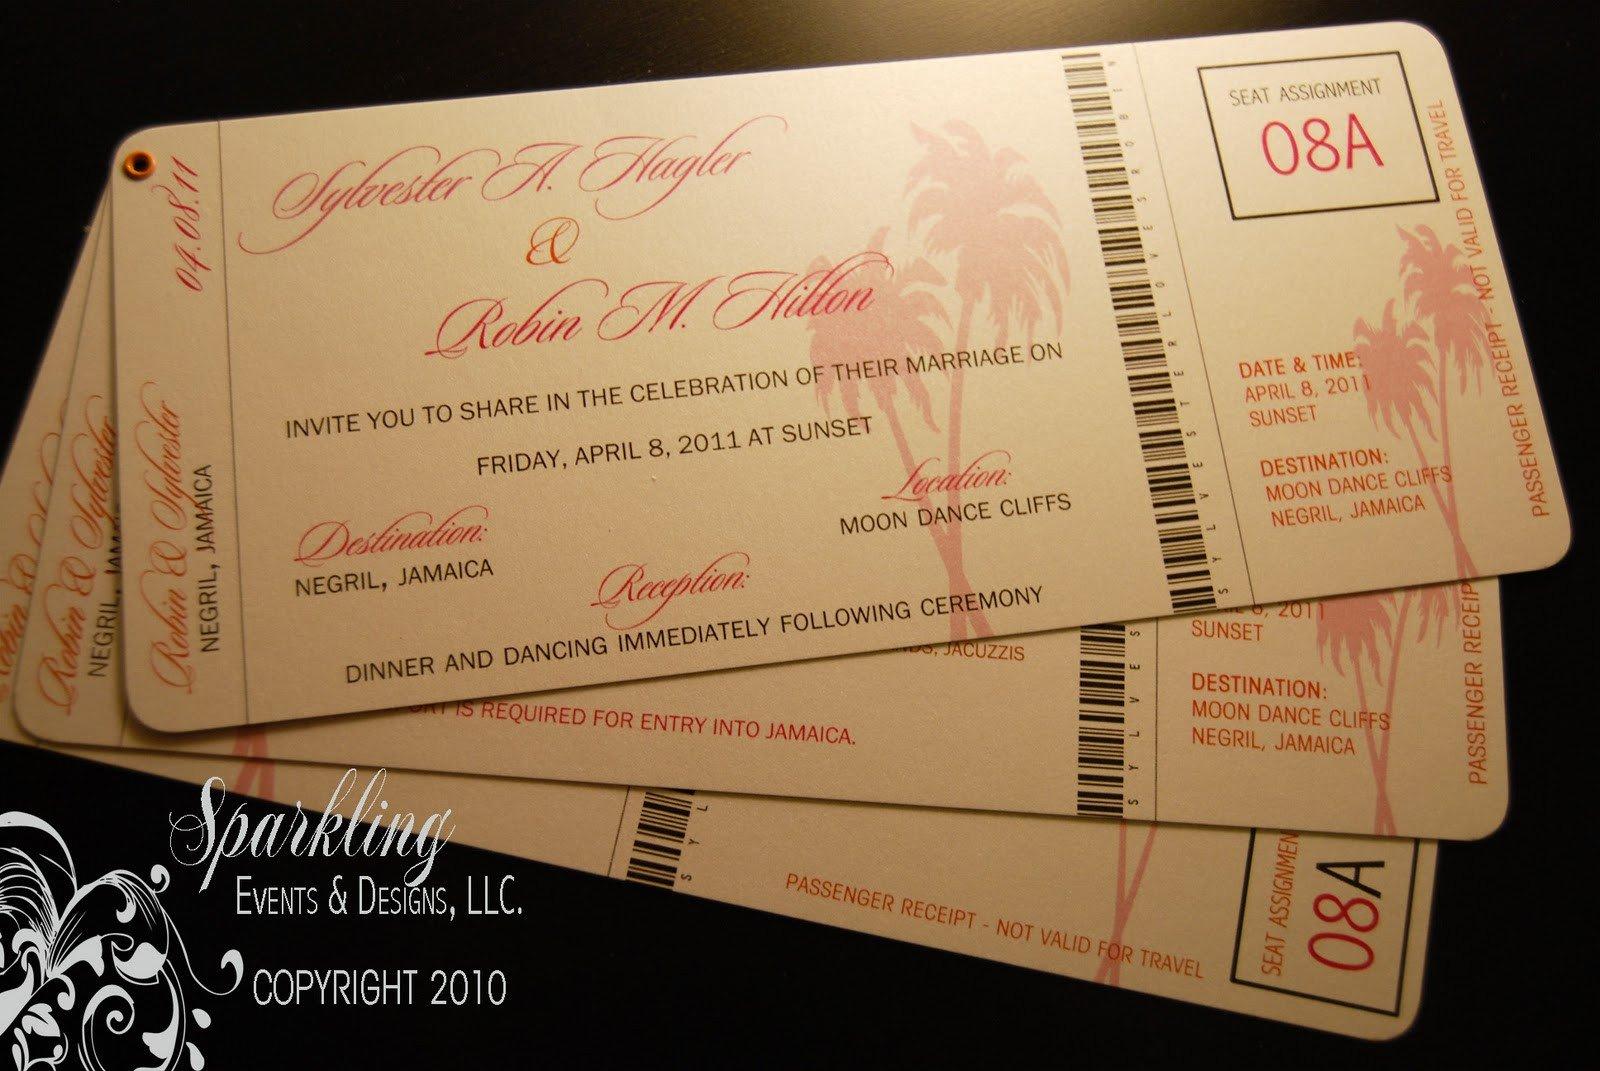 Boarding Pass Wedding Invitations Boarding Pass Wedding Invitations Sparkling events & Designs